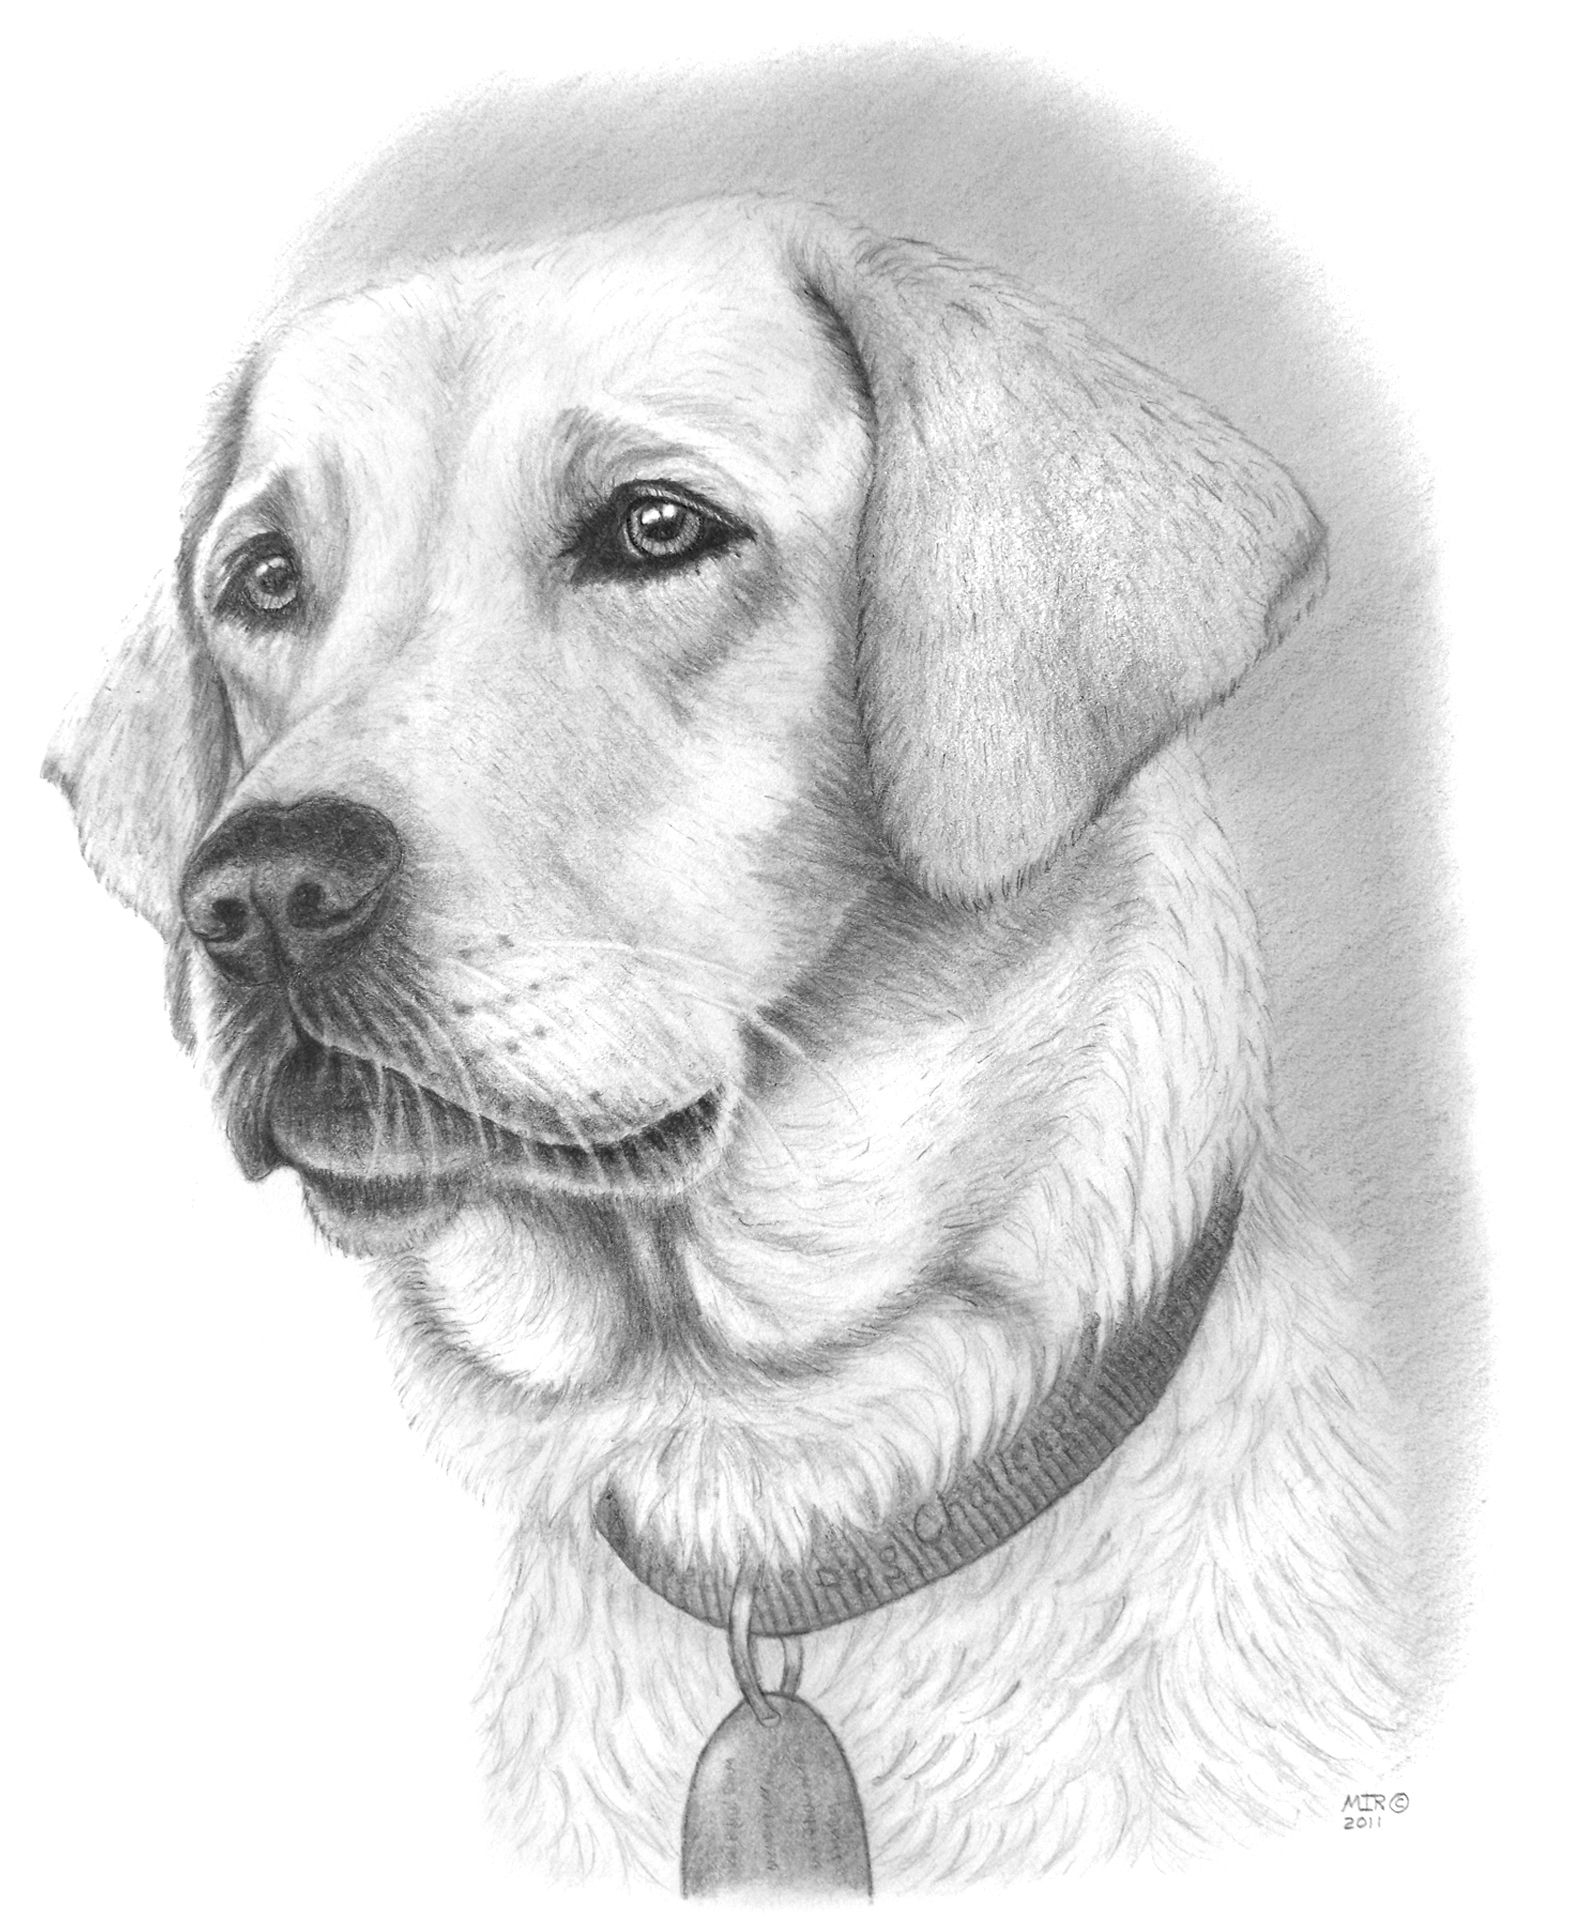 Pretty Dog Drawing Dog Face Drawing Dog Pencil Drawing Dog Sketch